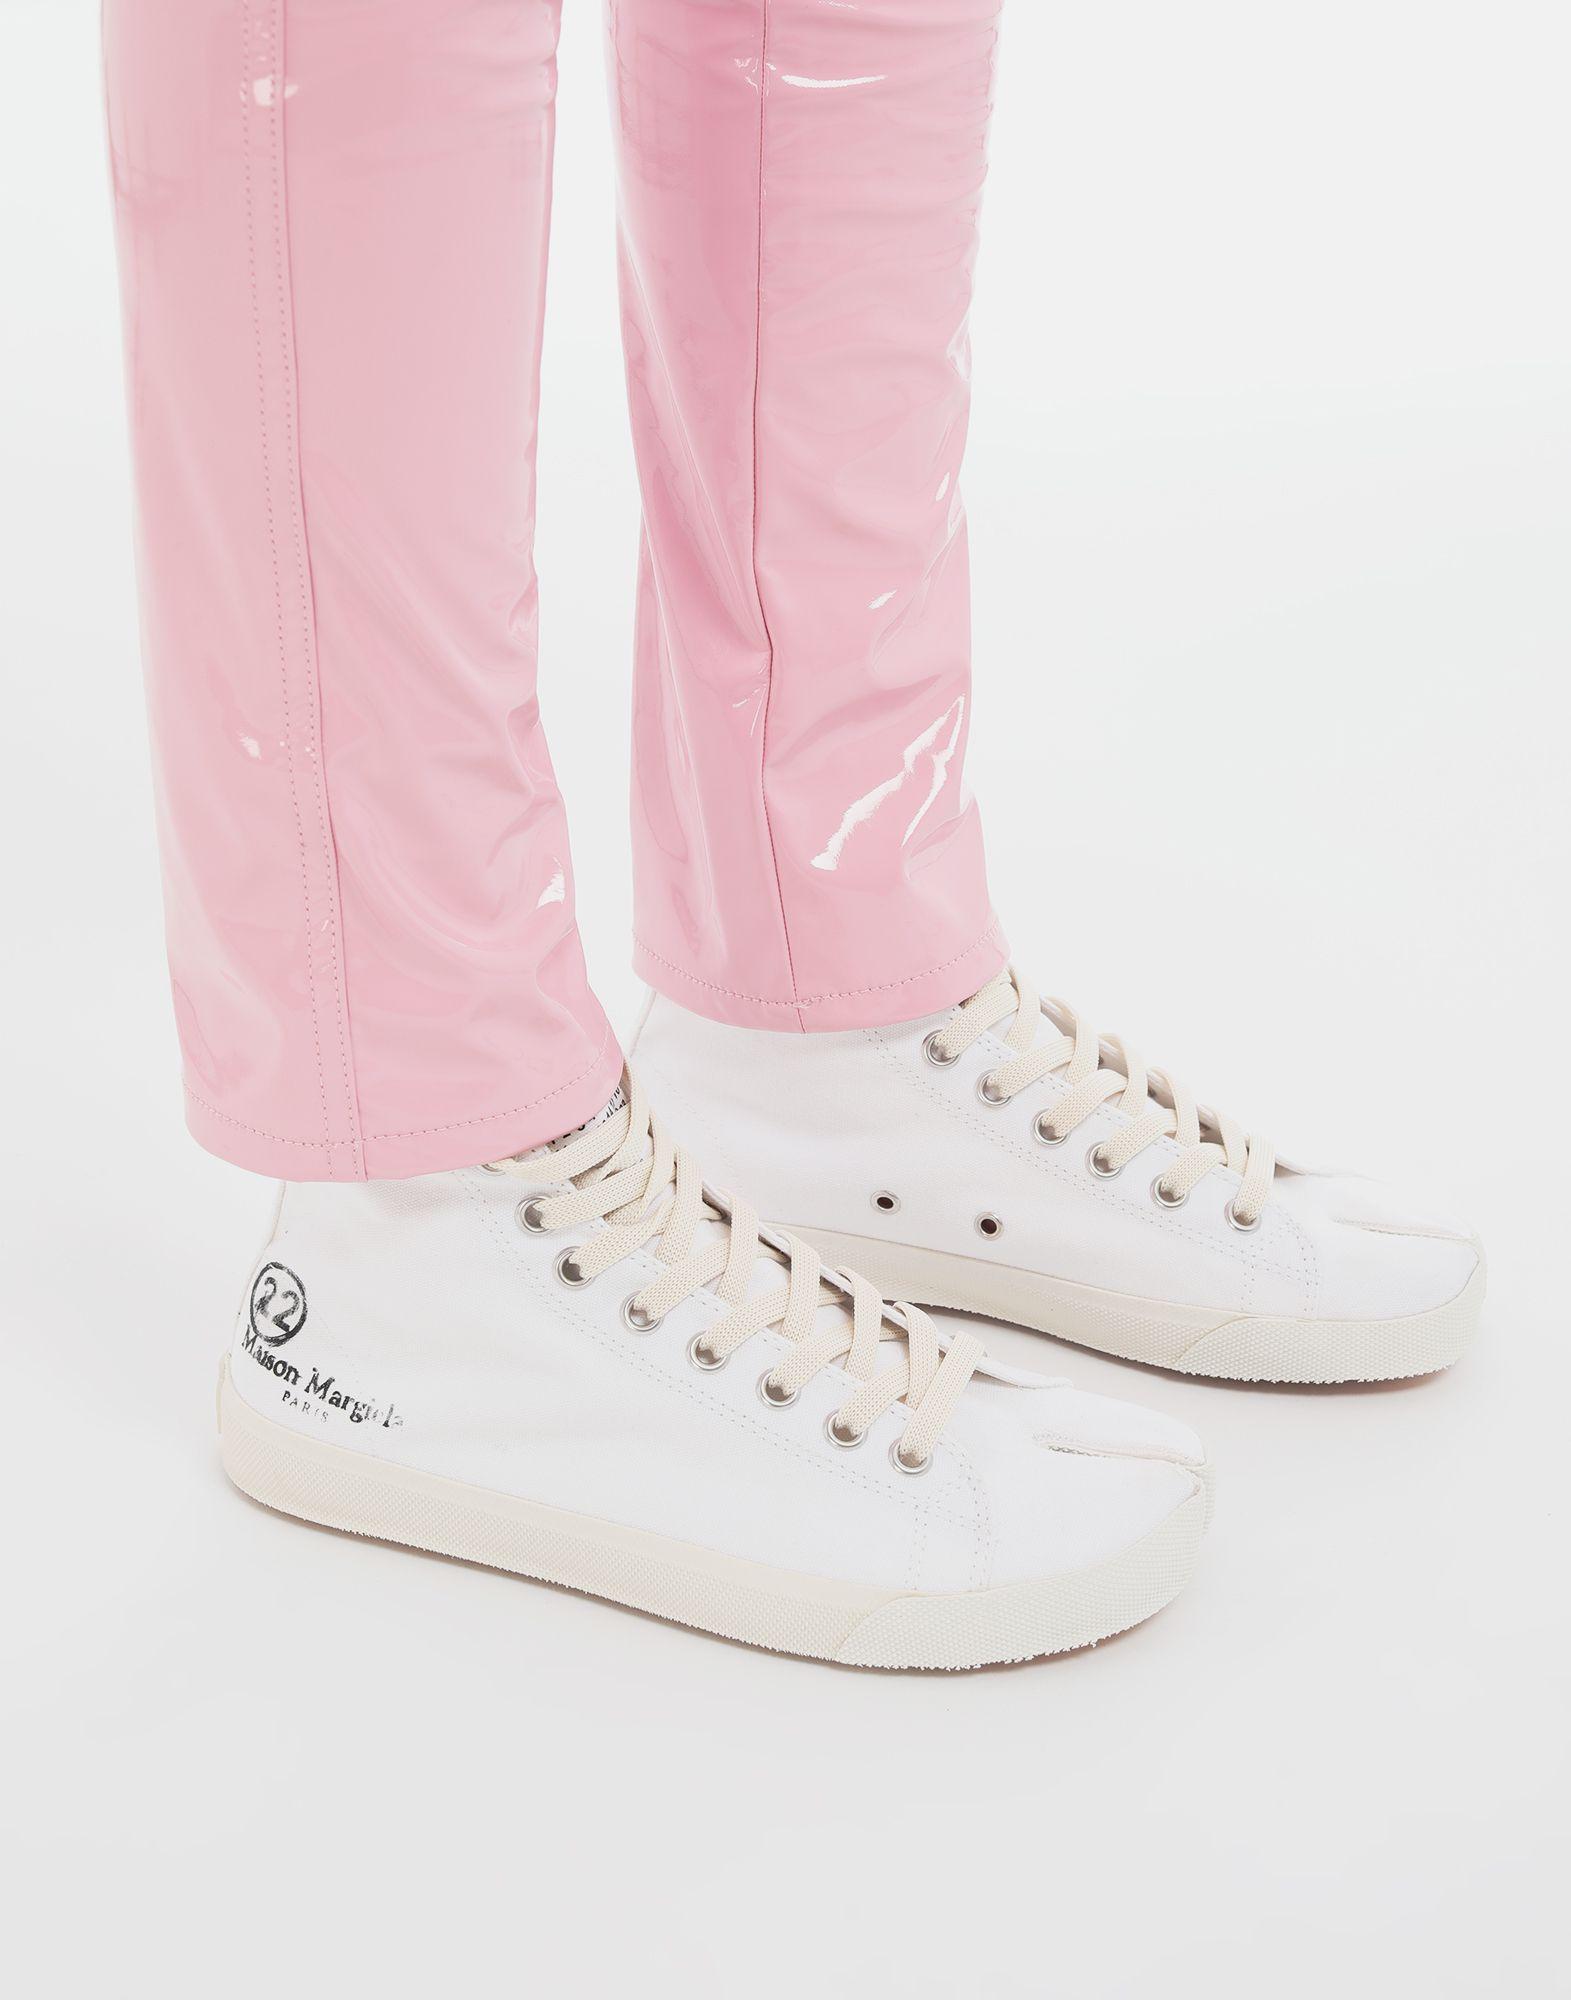 MAISON MARGIELA Tabi high top canvas sneakers Sneakers Tabi Woman b